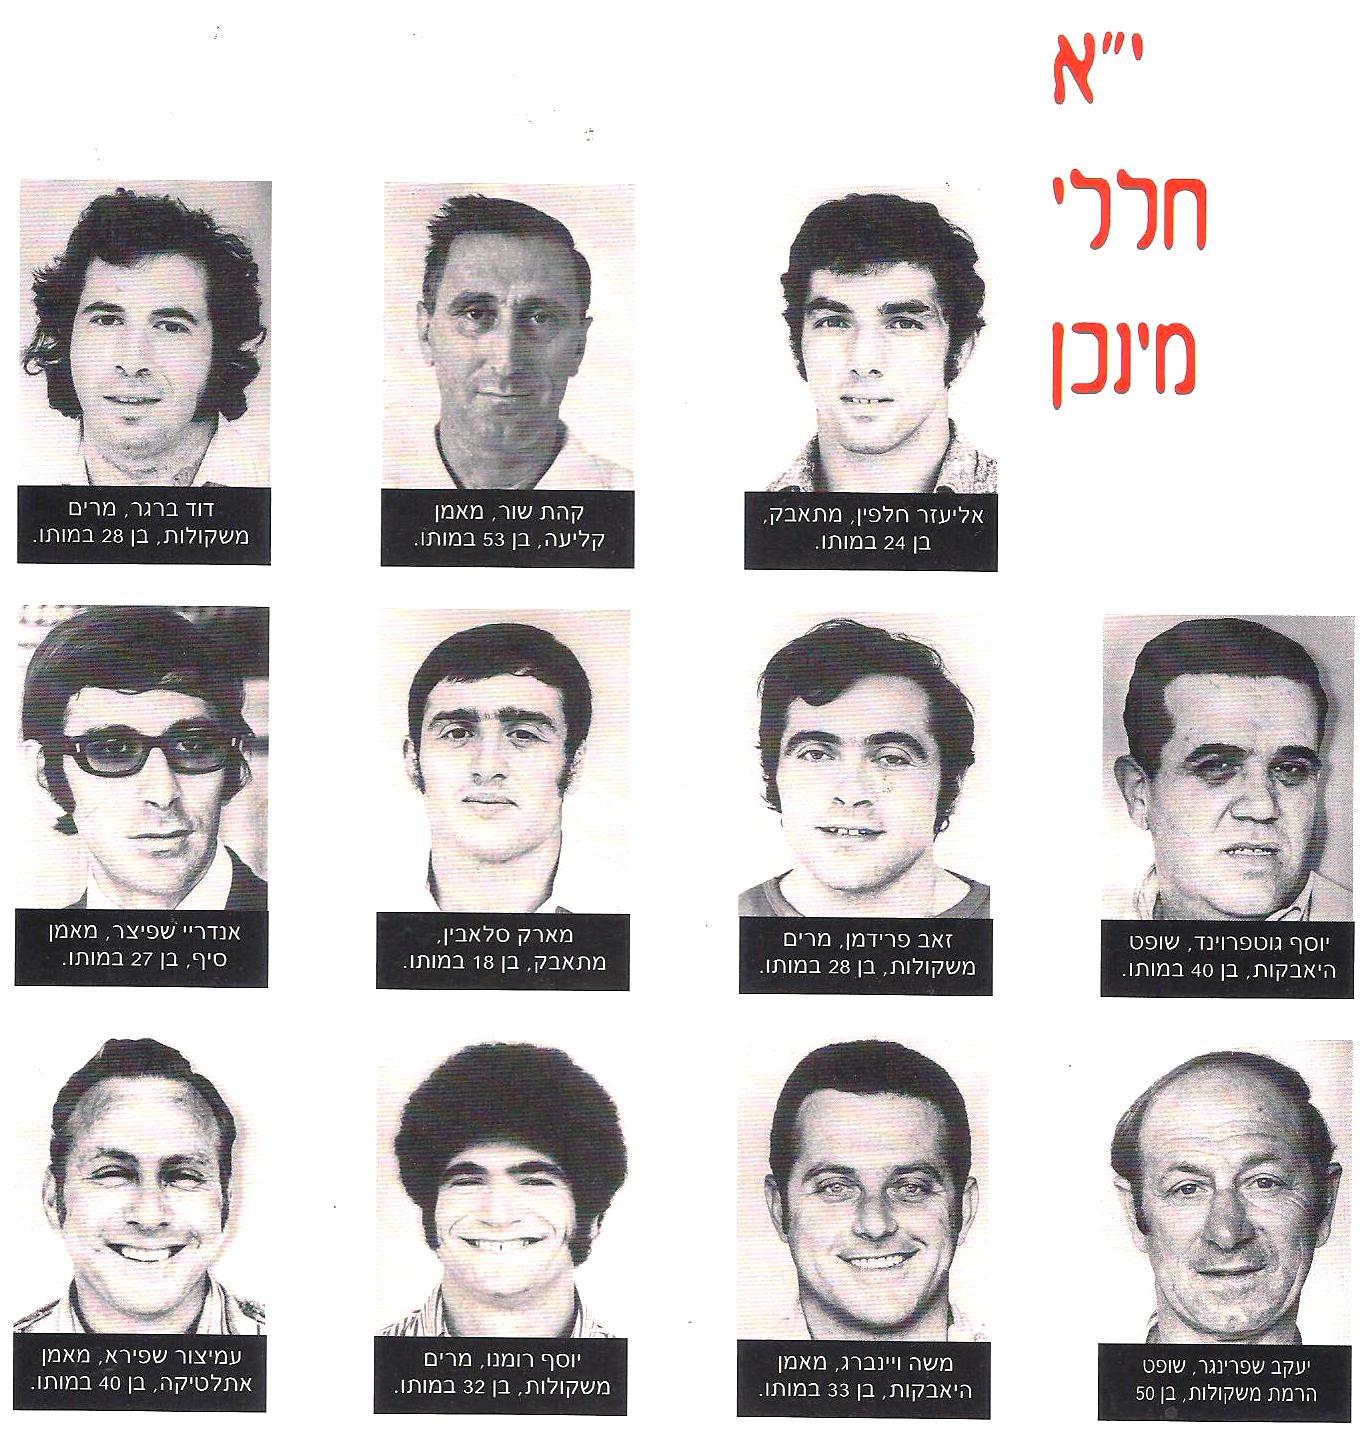 munich 1972 the 11 victims